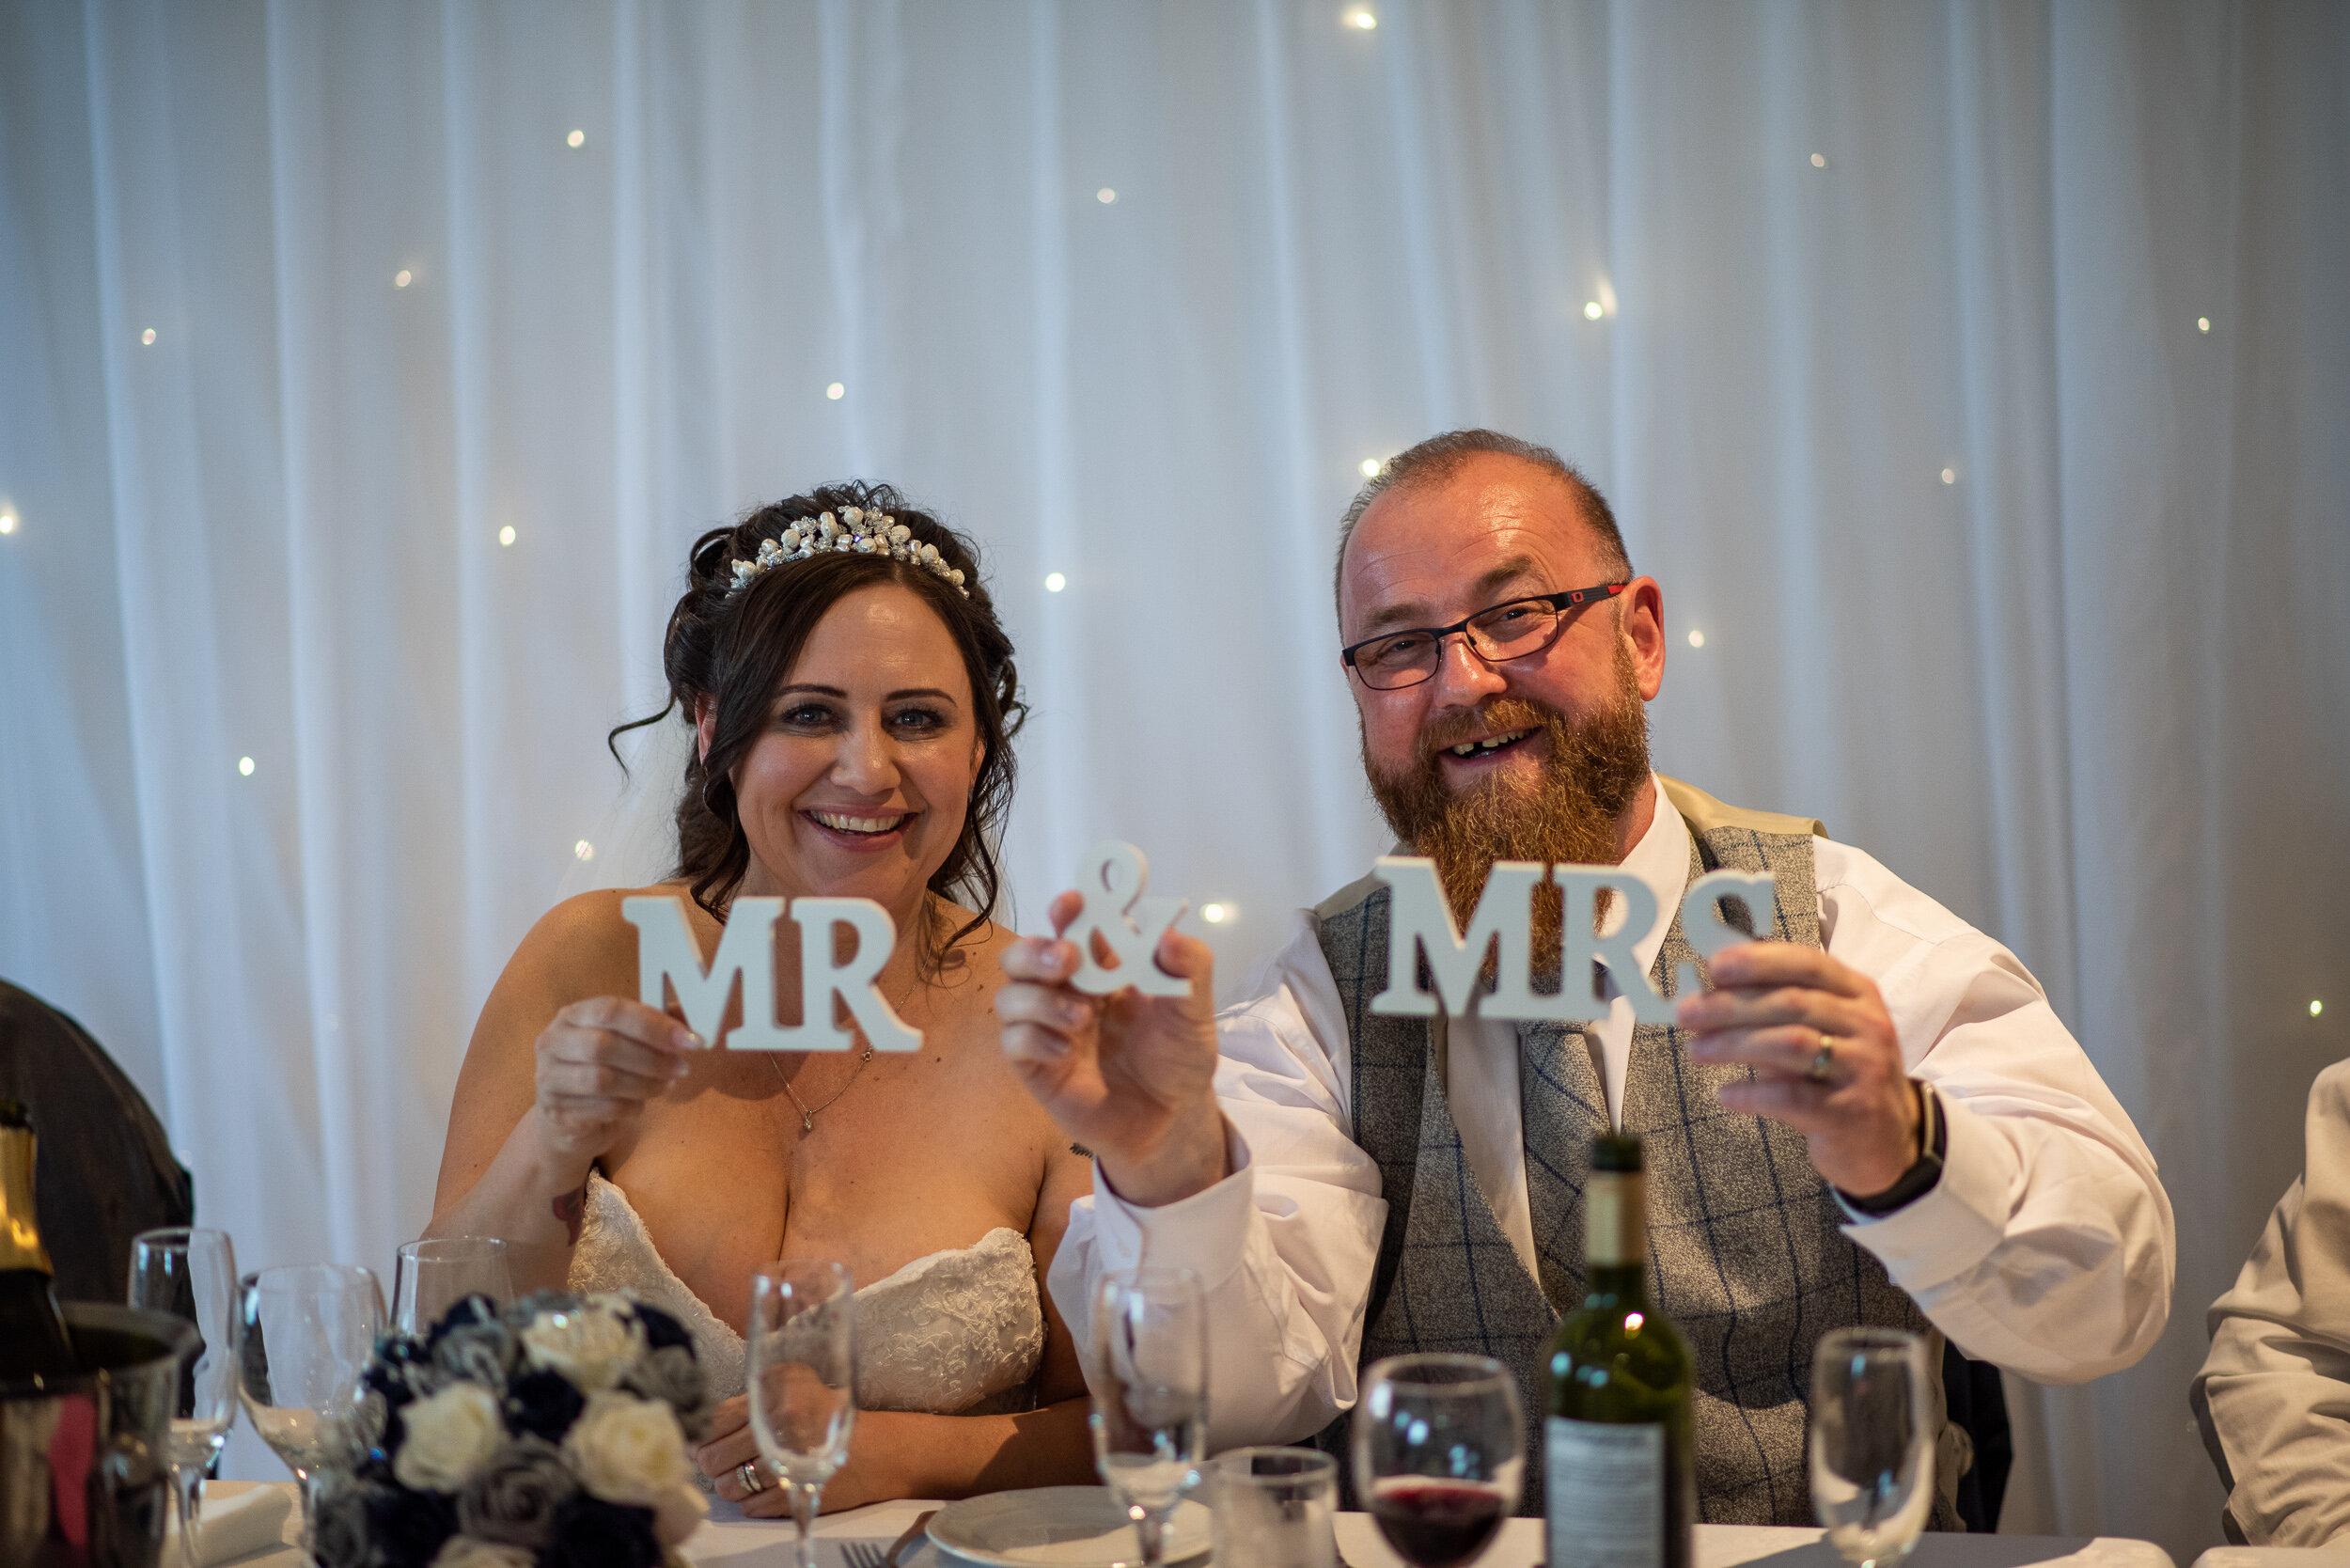 Heaton_wedding_photos_Gretna-17.jpg